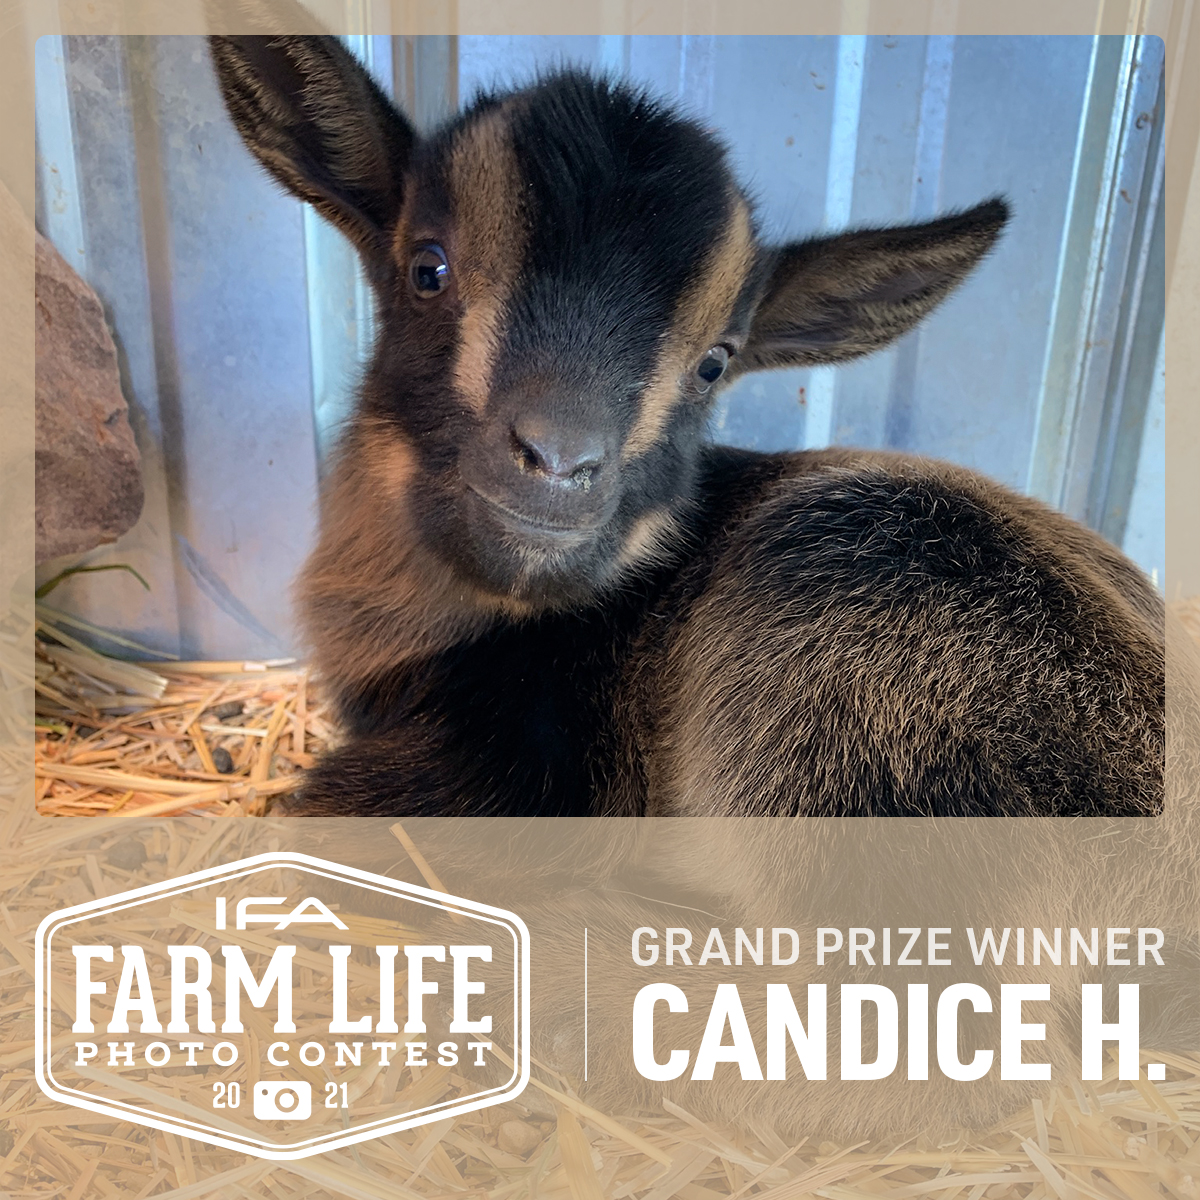 IFA_FarmLife21_GrandPrize_Winner